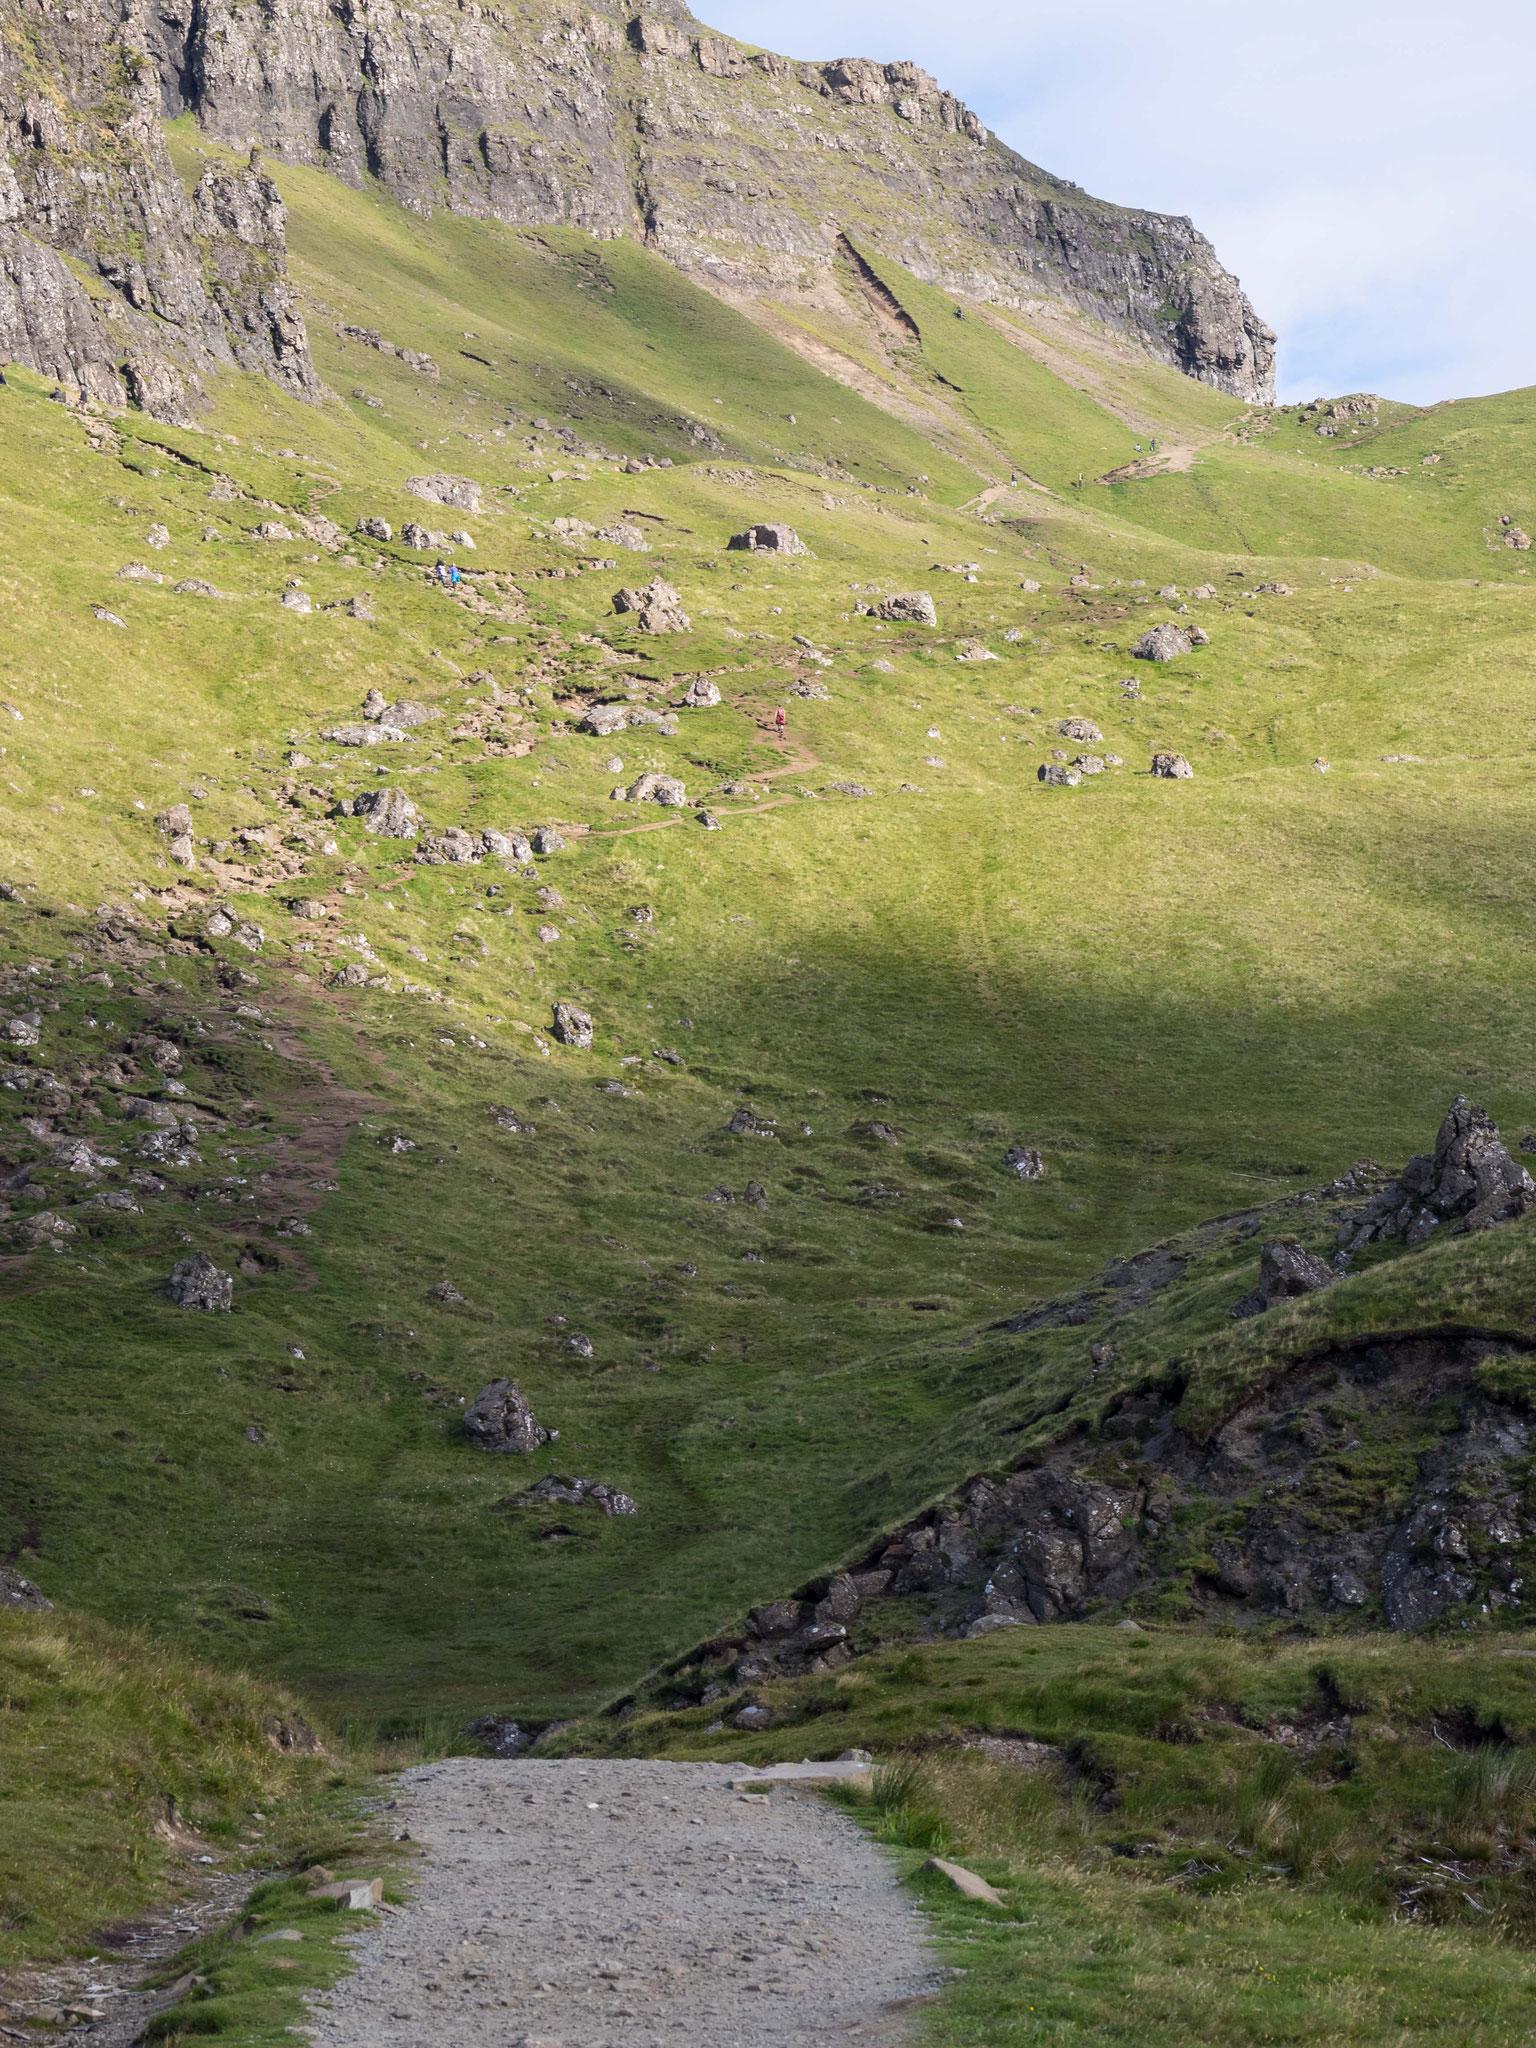 Bild: Trotternish Wanderung